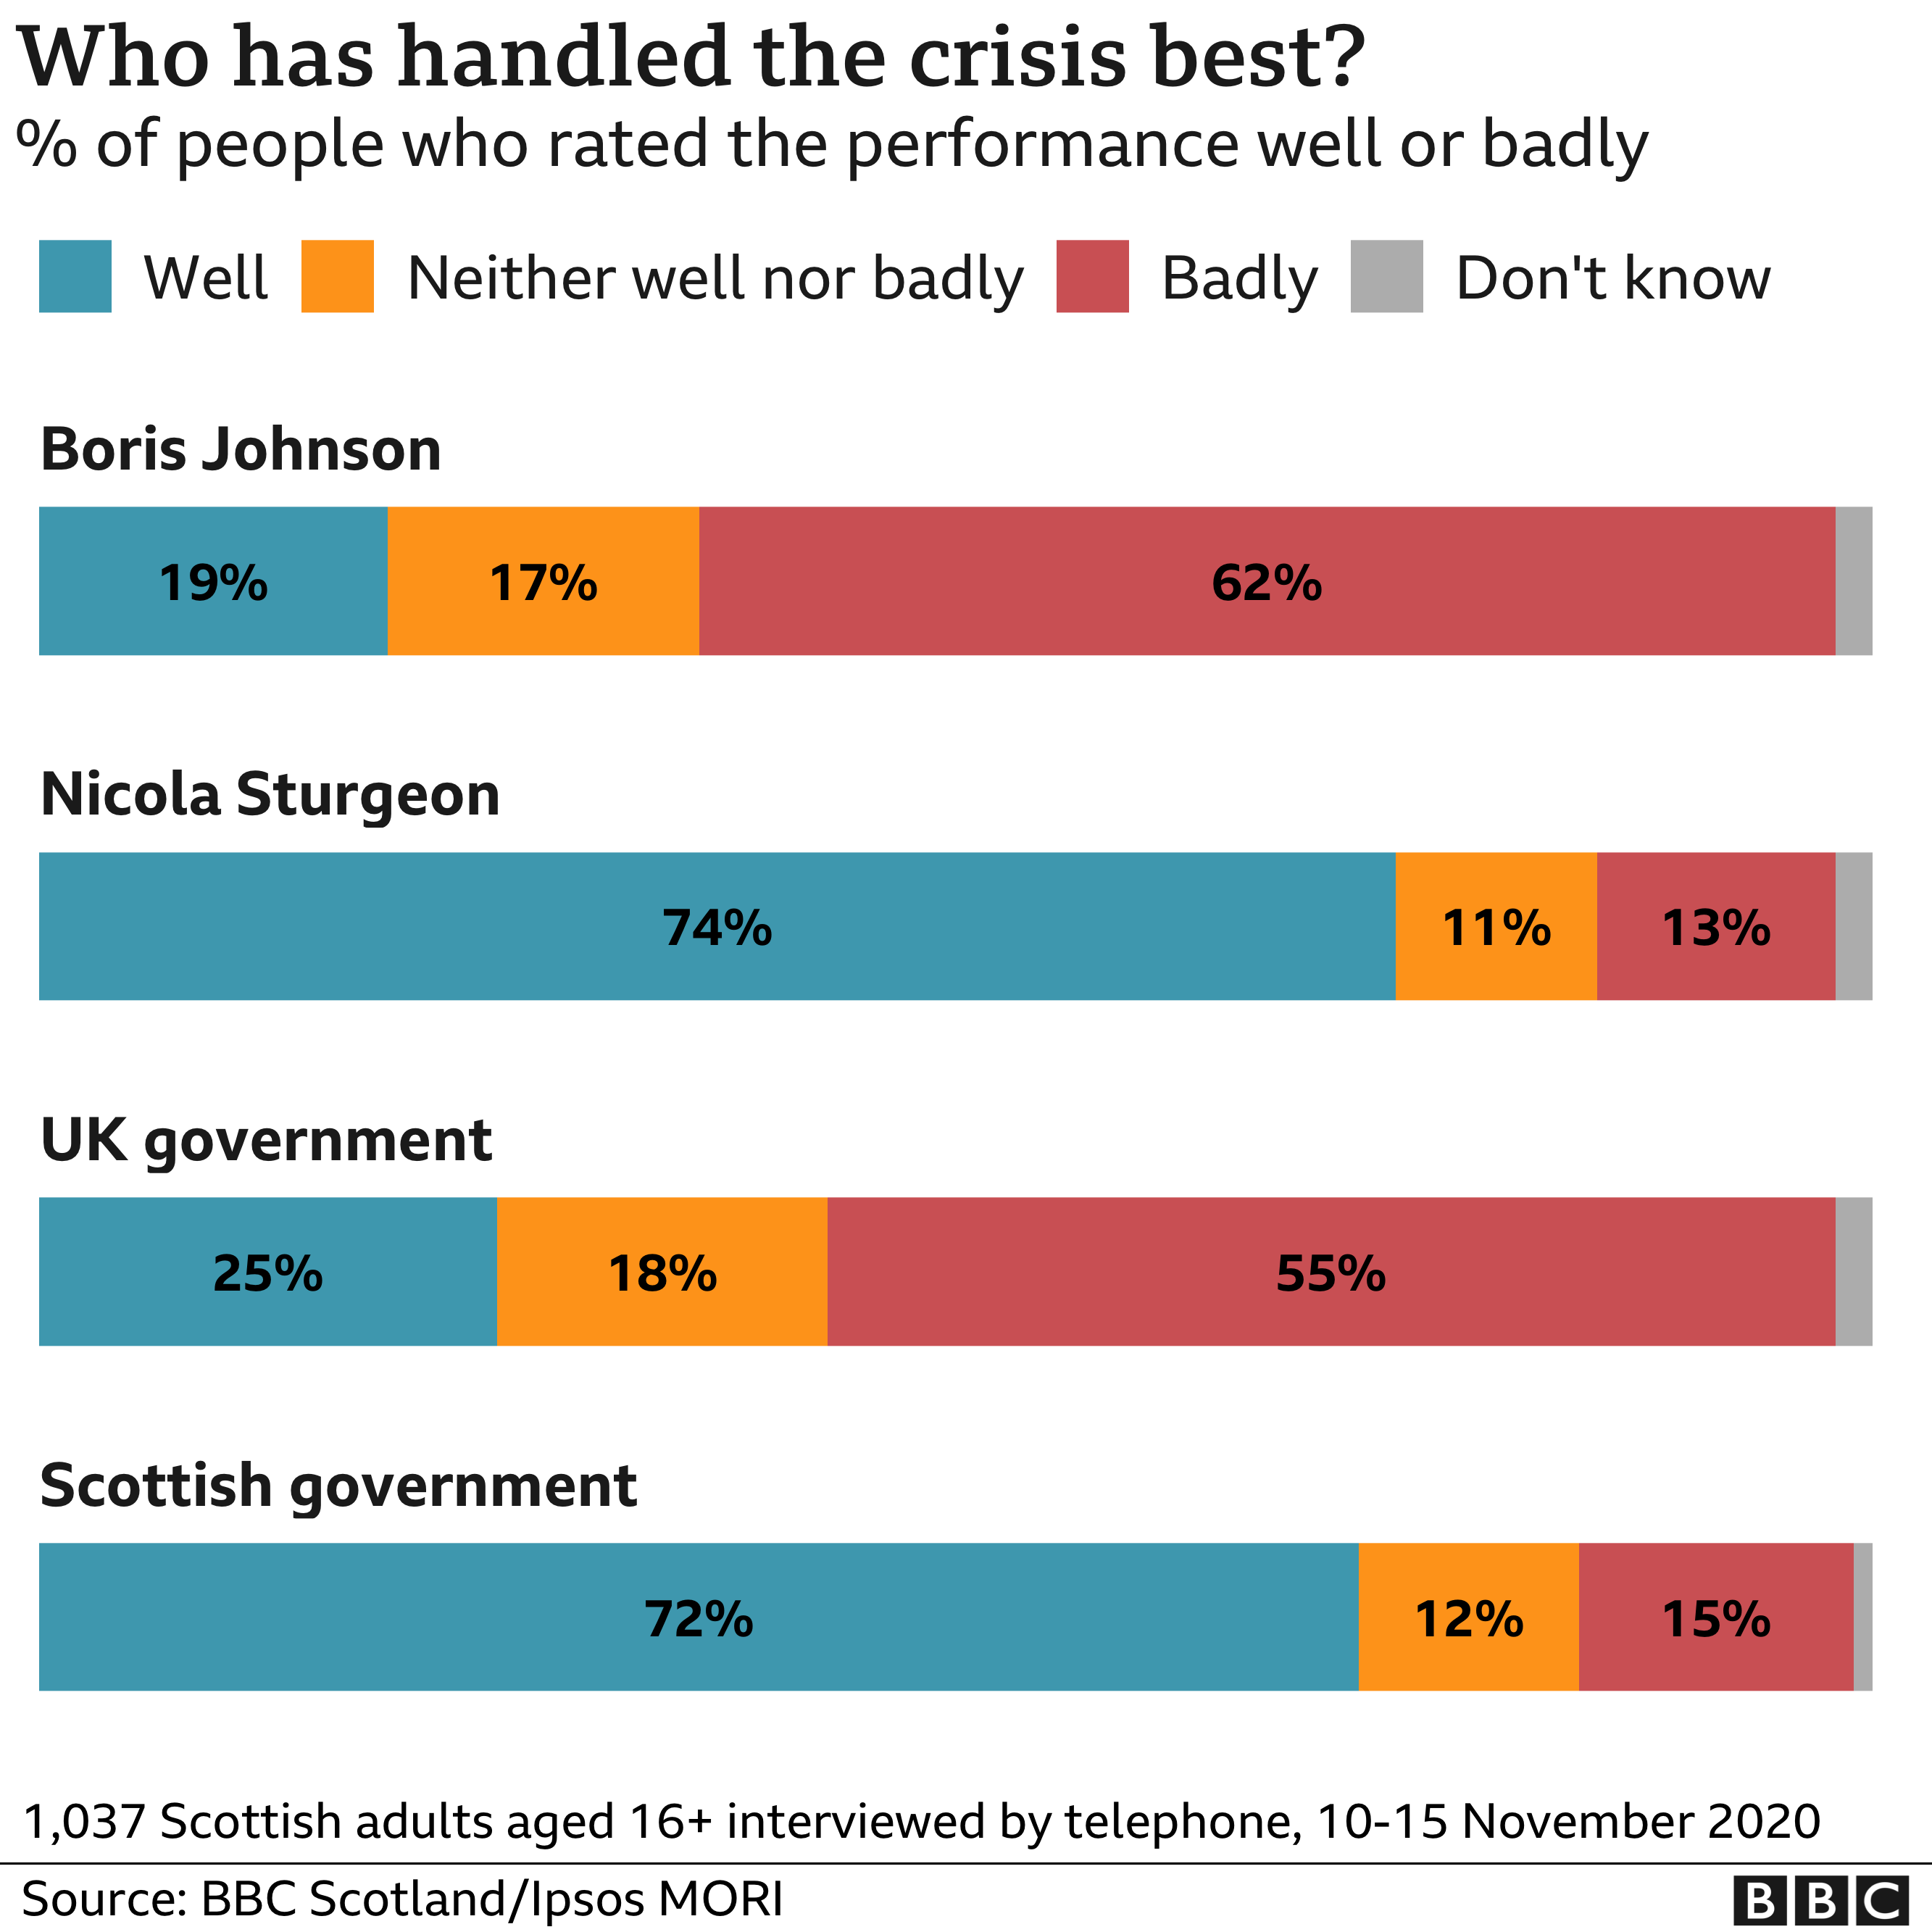 graph on handling of crisis